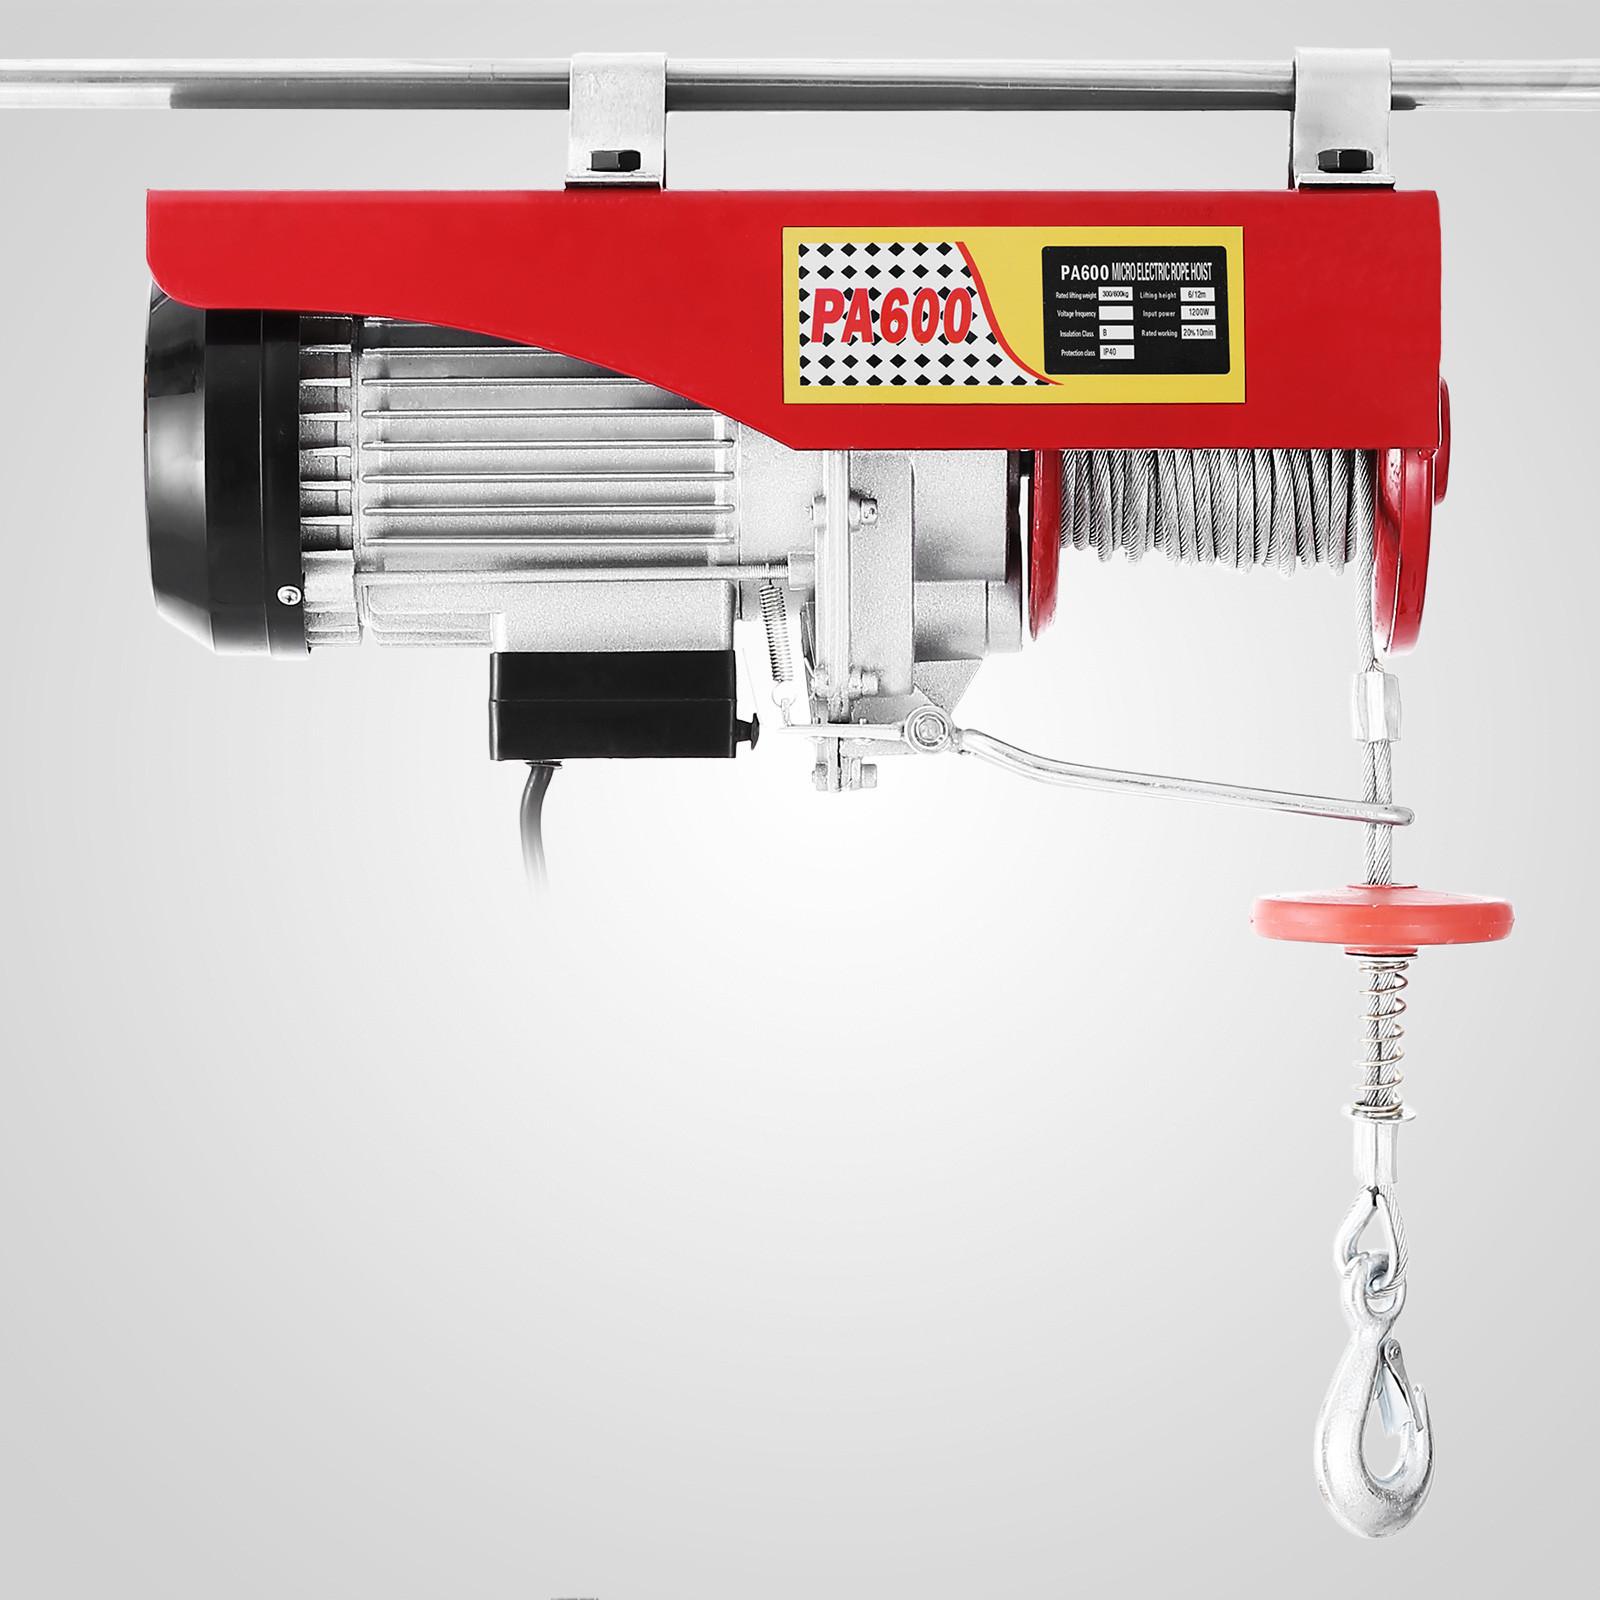 100kg-900kg-Electric-Hoist-Winch-Lifting-Engine-Crane-Cable-Lift-Hook-Garage miniature 40